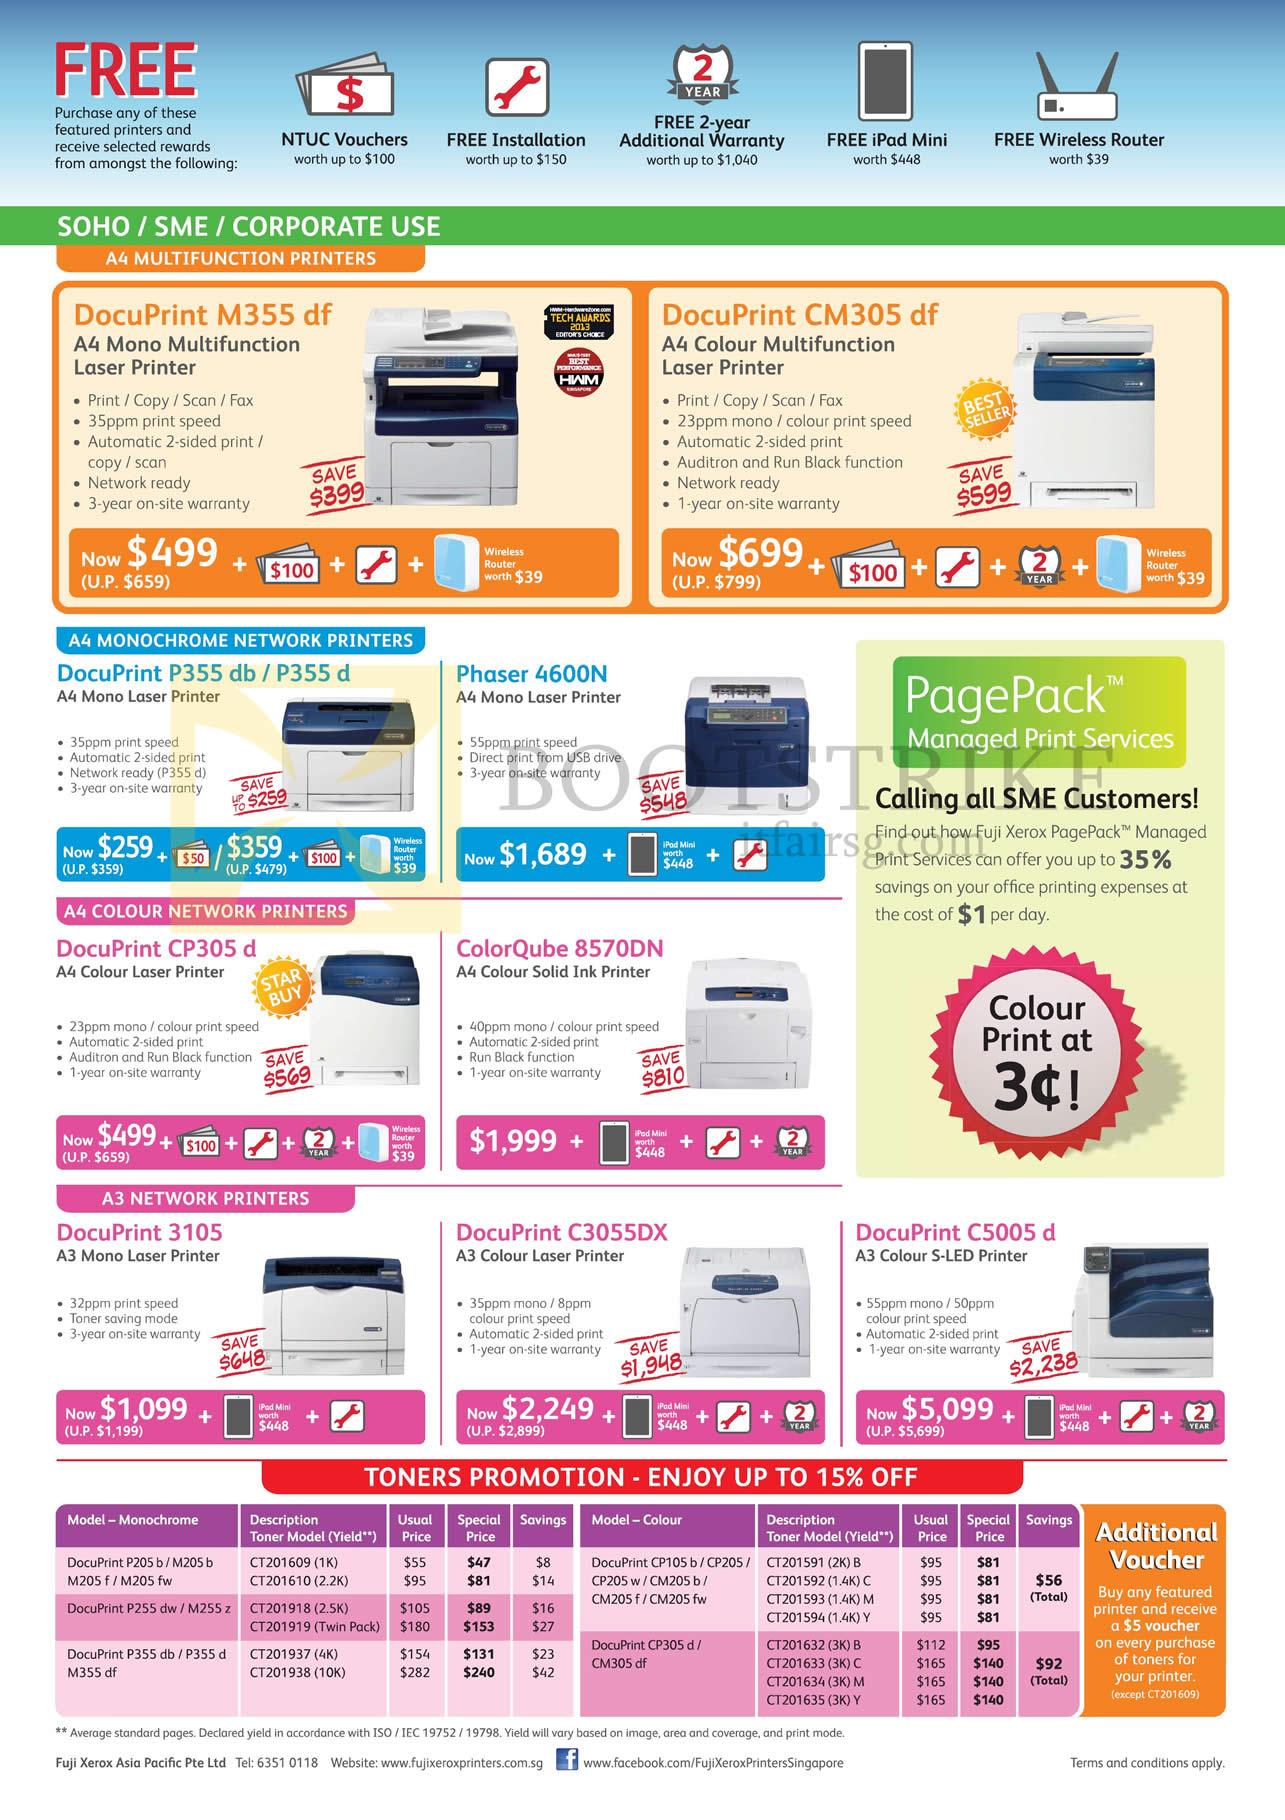 Fuji Xerox Printers Laser S-LED DocuPrint M355 Df, CM305 Df, P355 Db